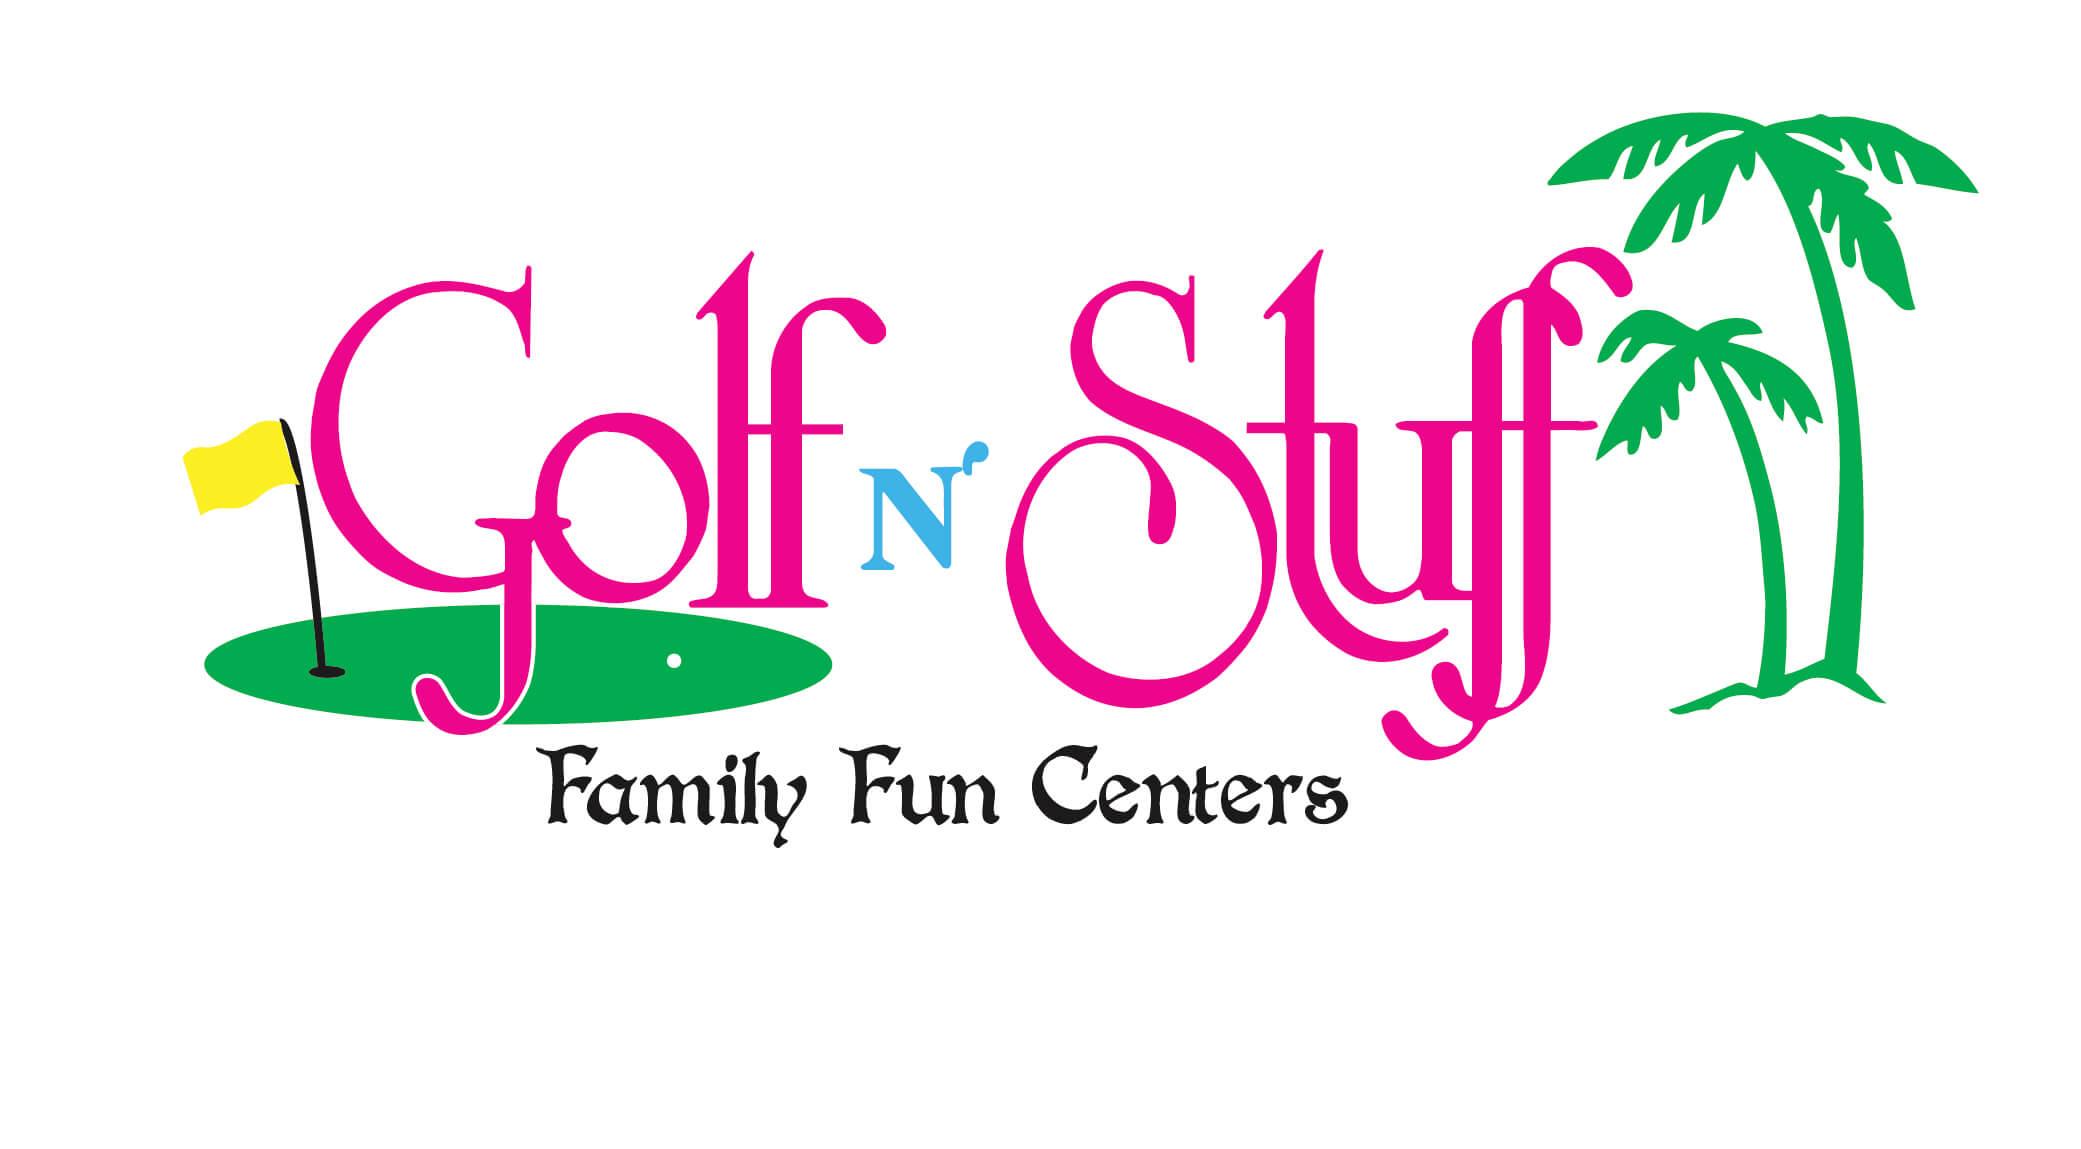 Golf N' Stuff